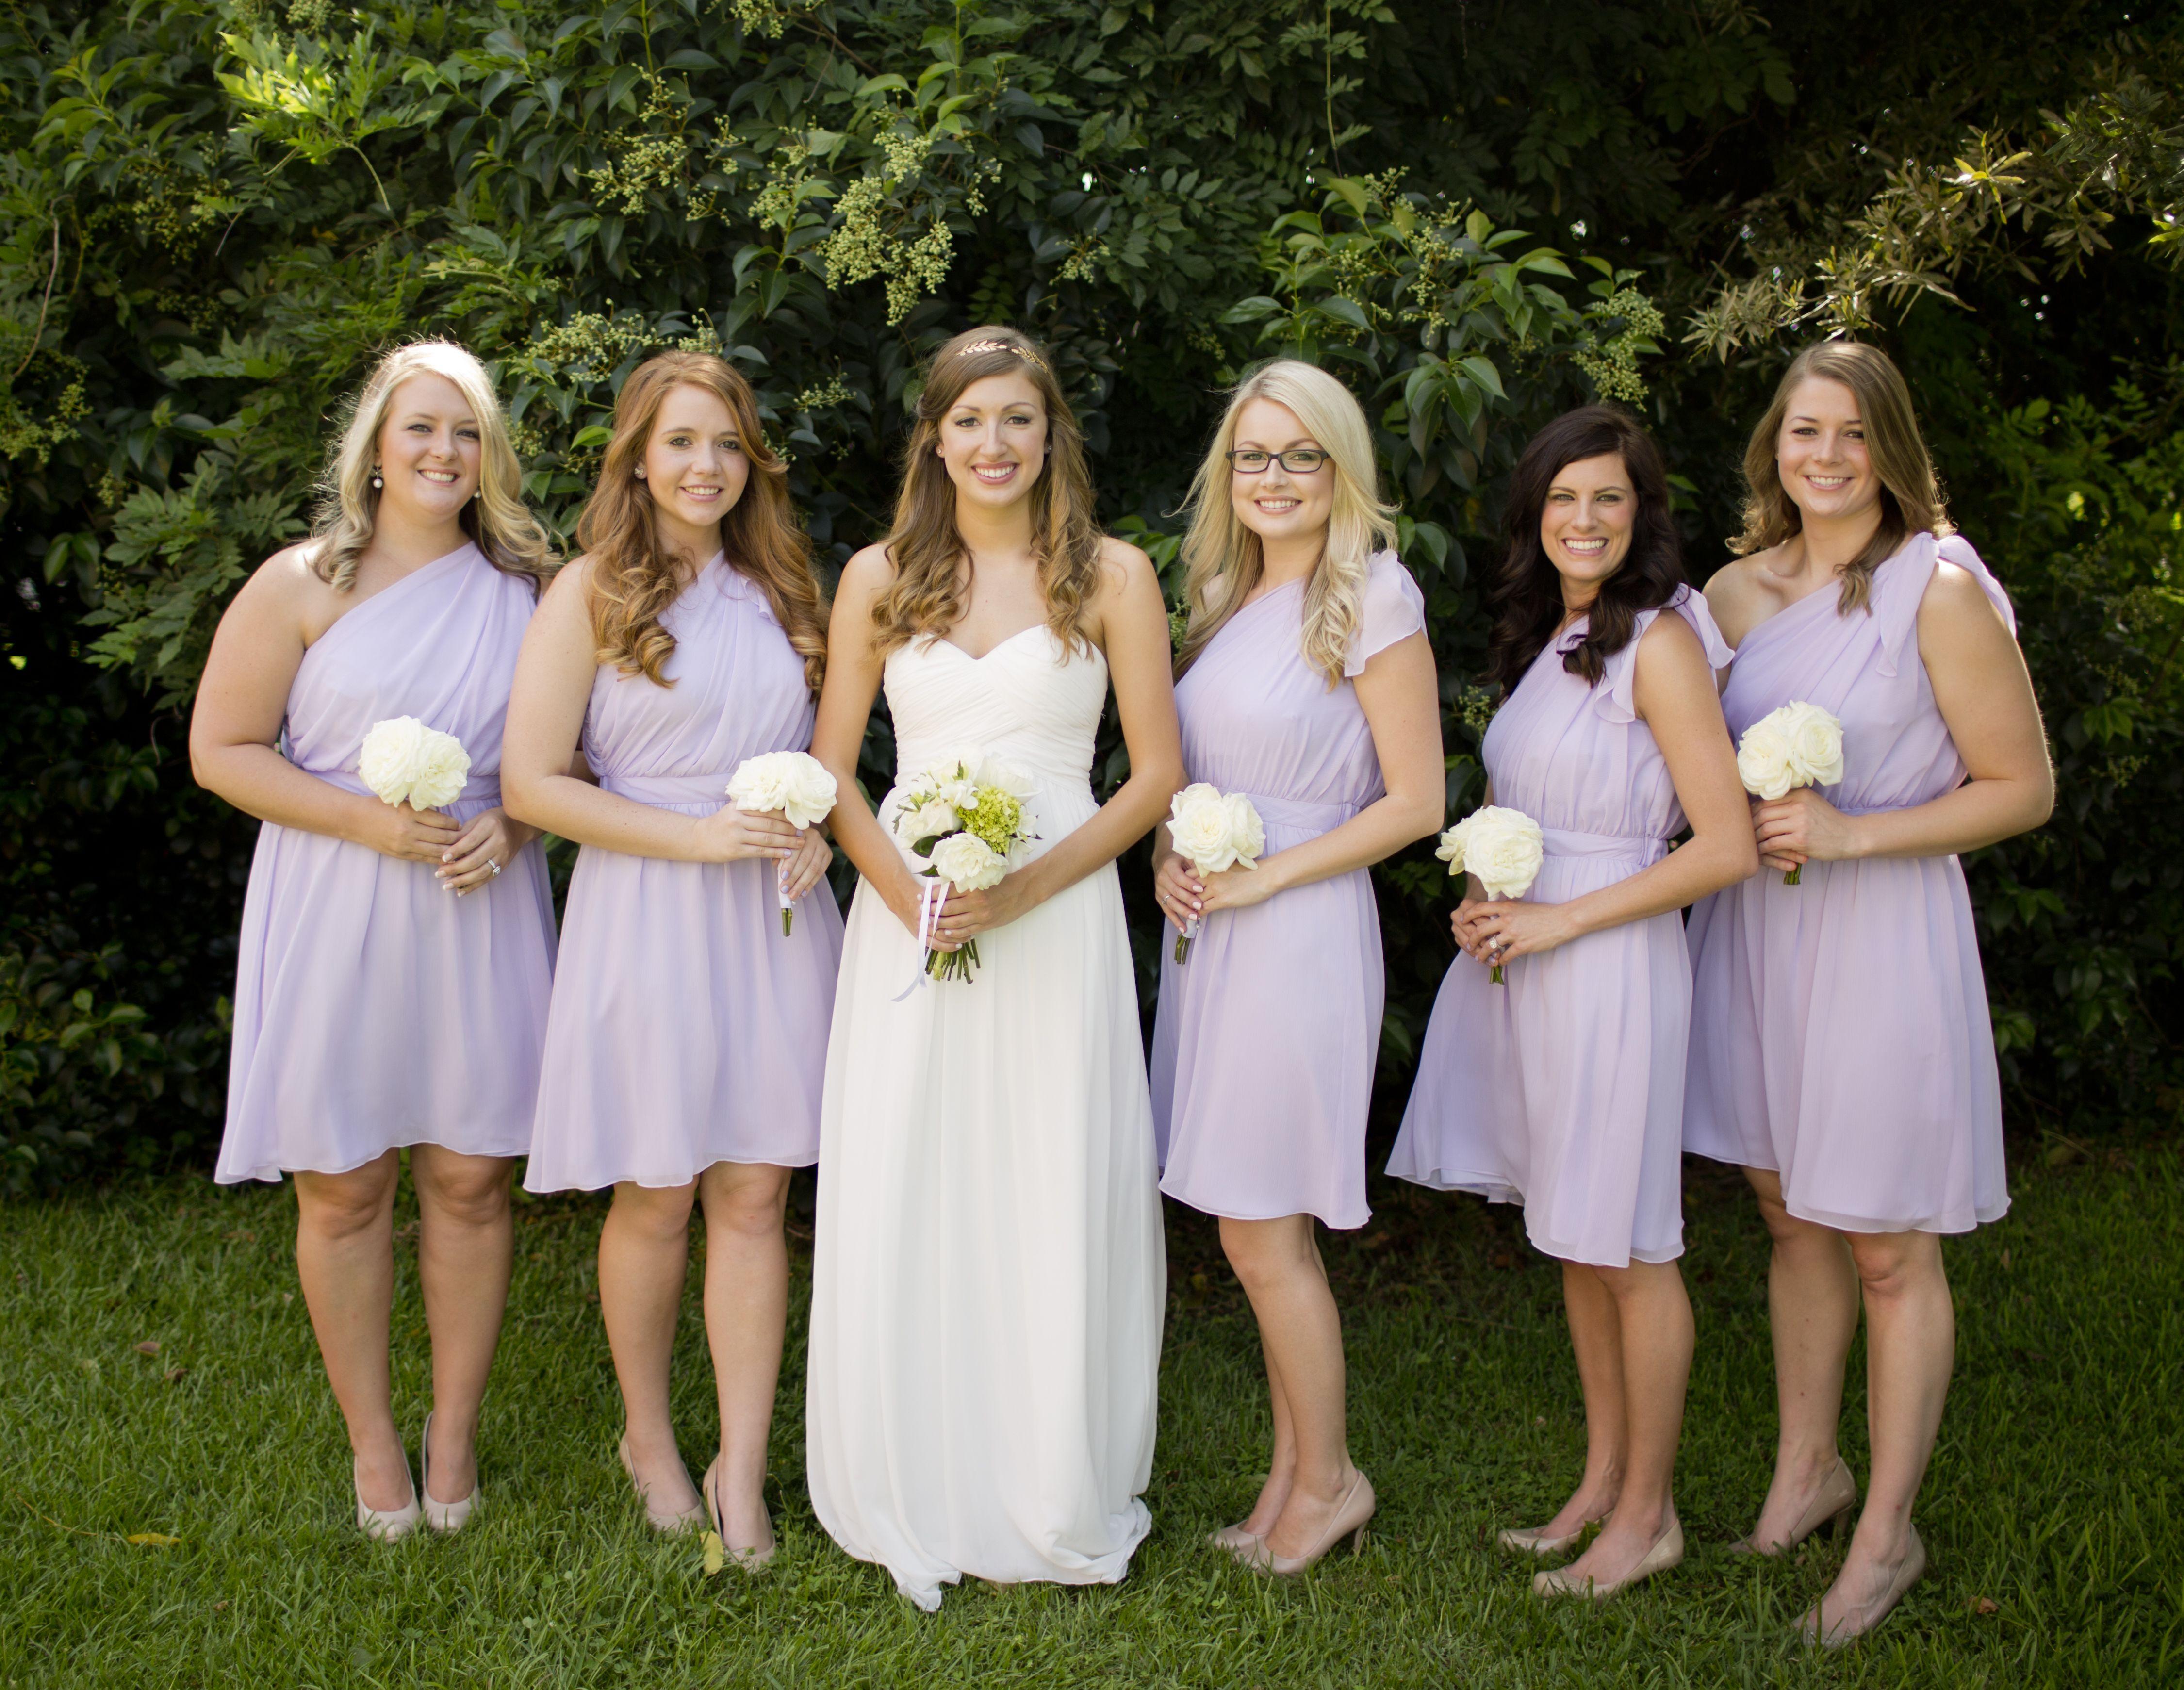 44 best iris images on pinterest bridesmaids wedding and flowers lbd bridesmaids in iris catherine bridesmaids dresses ombrellifo Choice Image